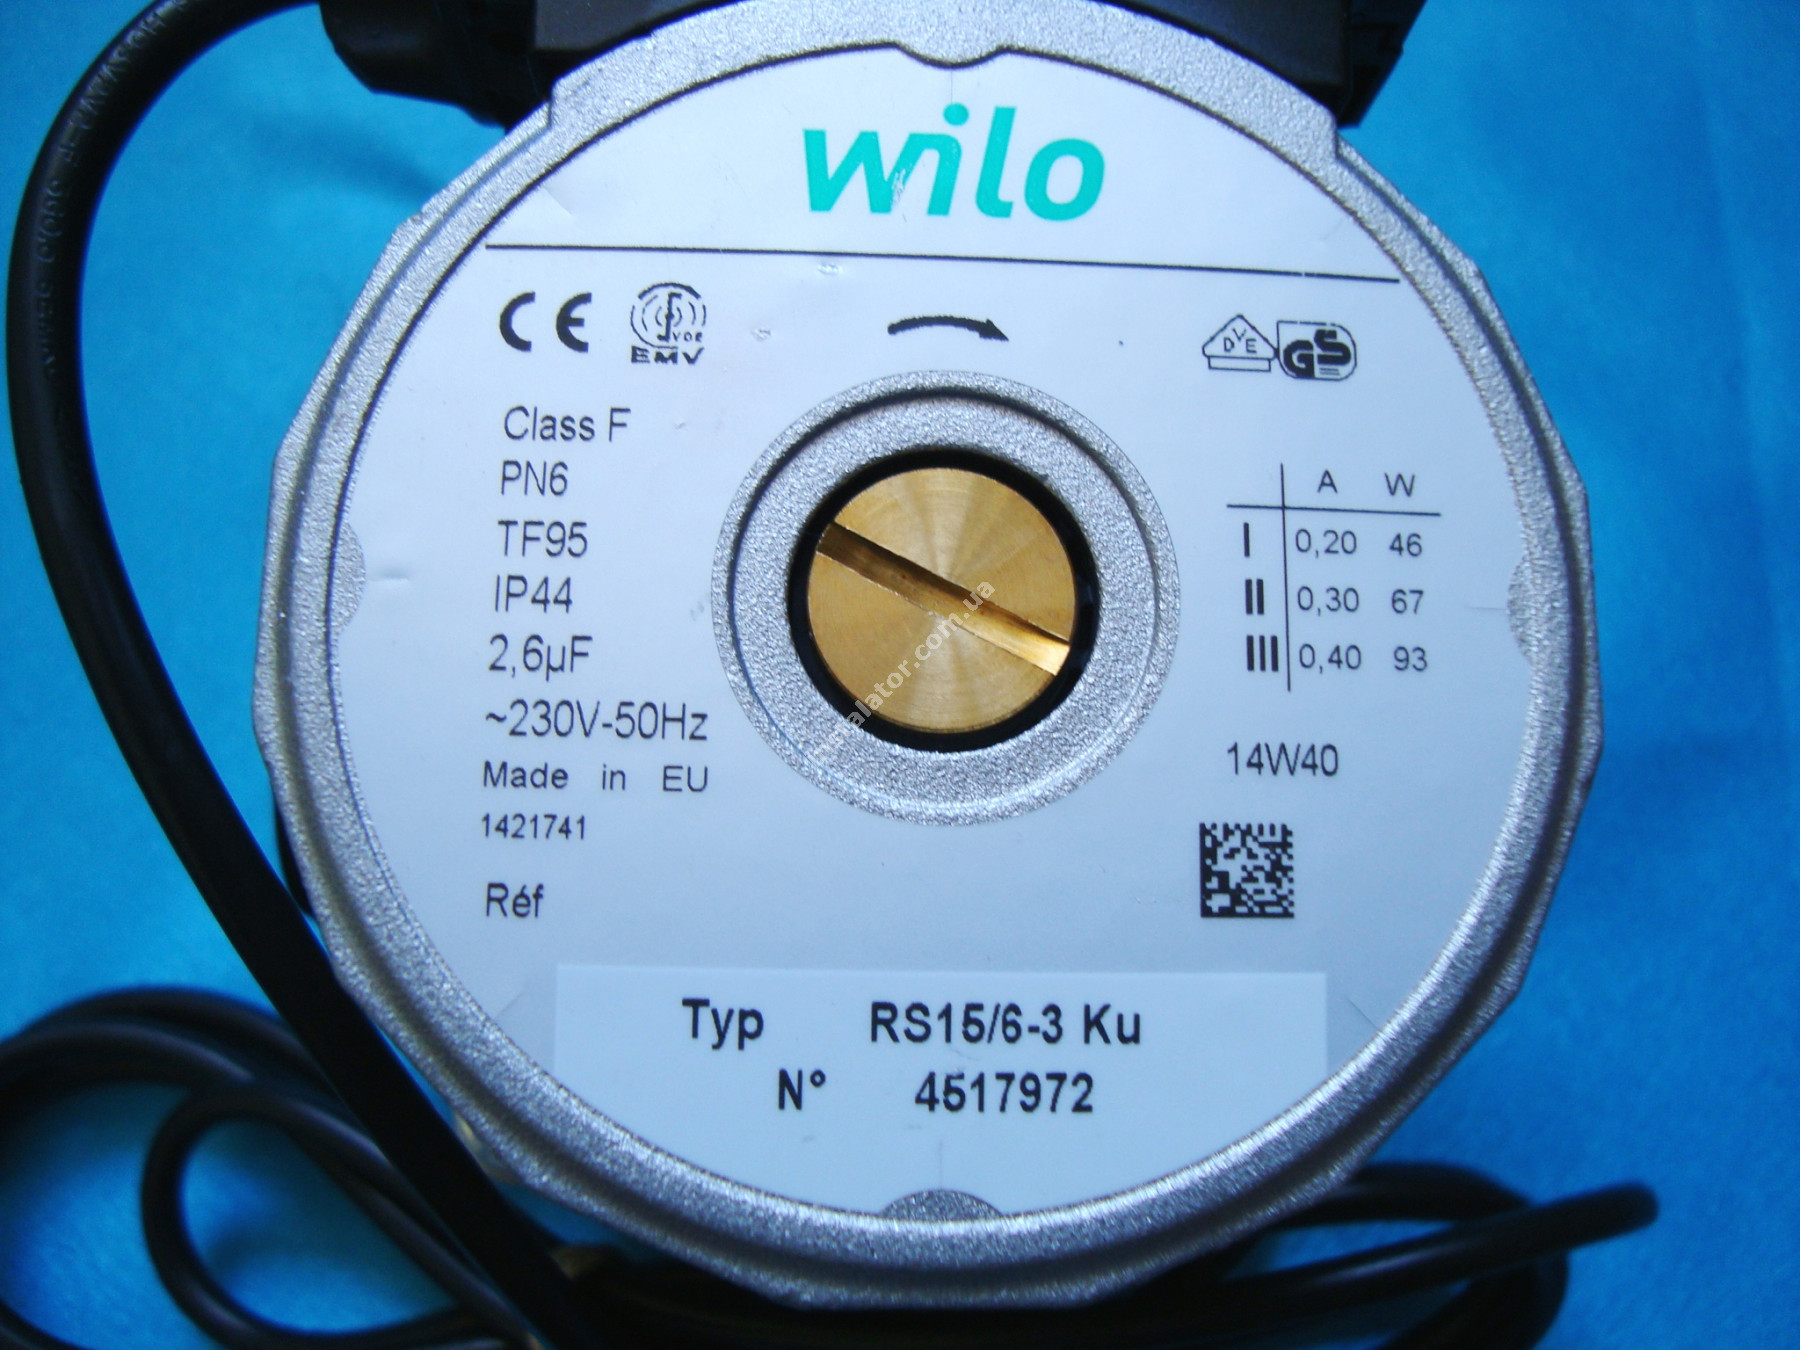 Циркуляційний насос Wilo RS 15/6 база 130 full-image-5